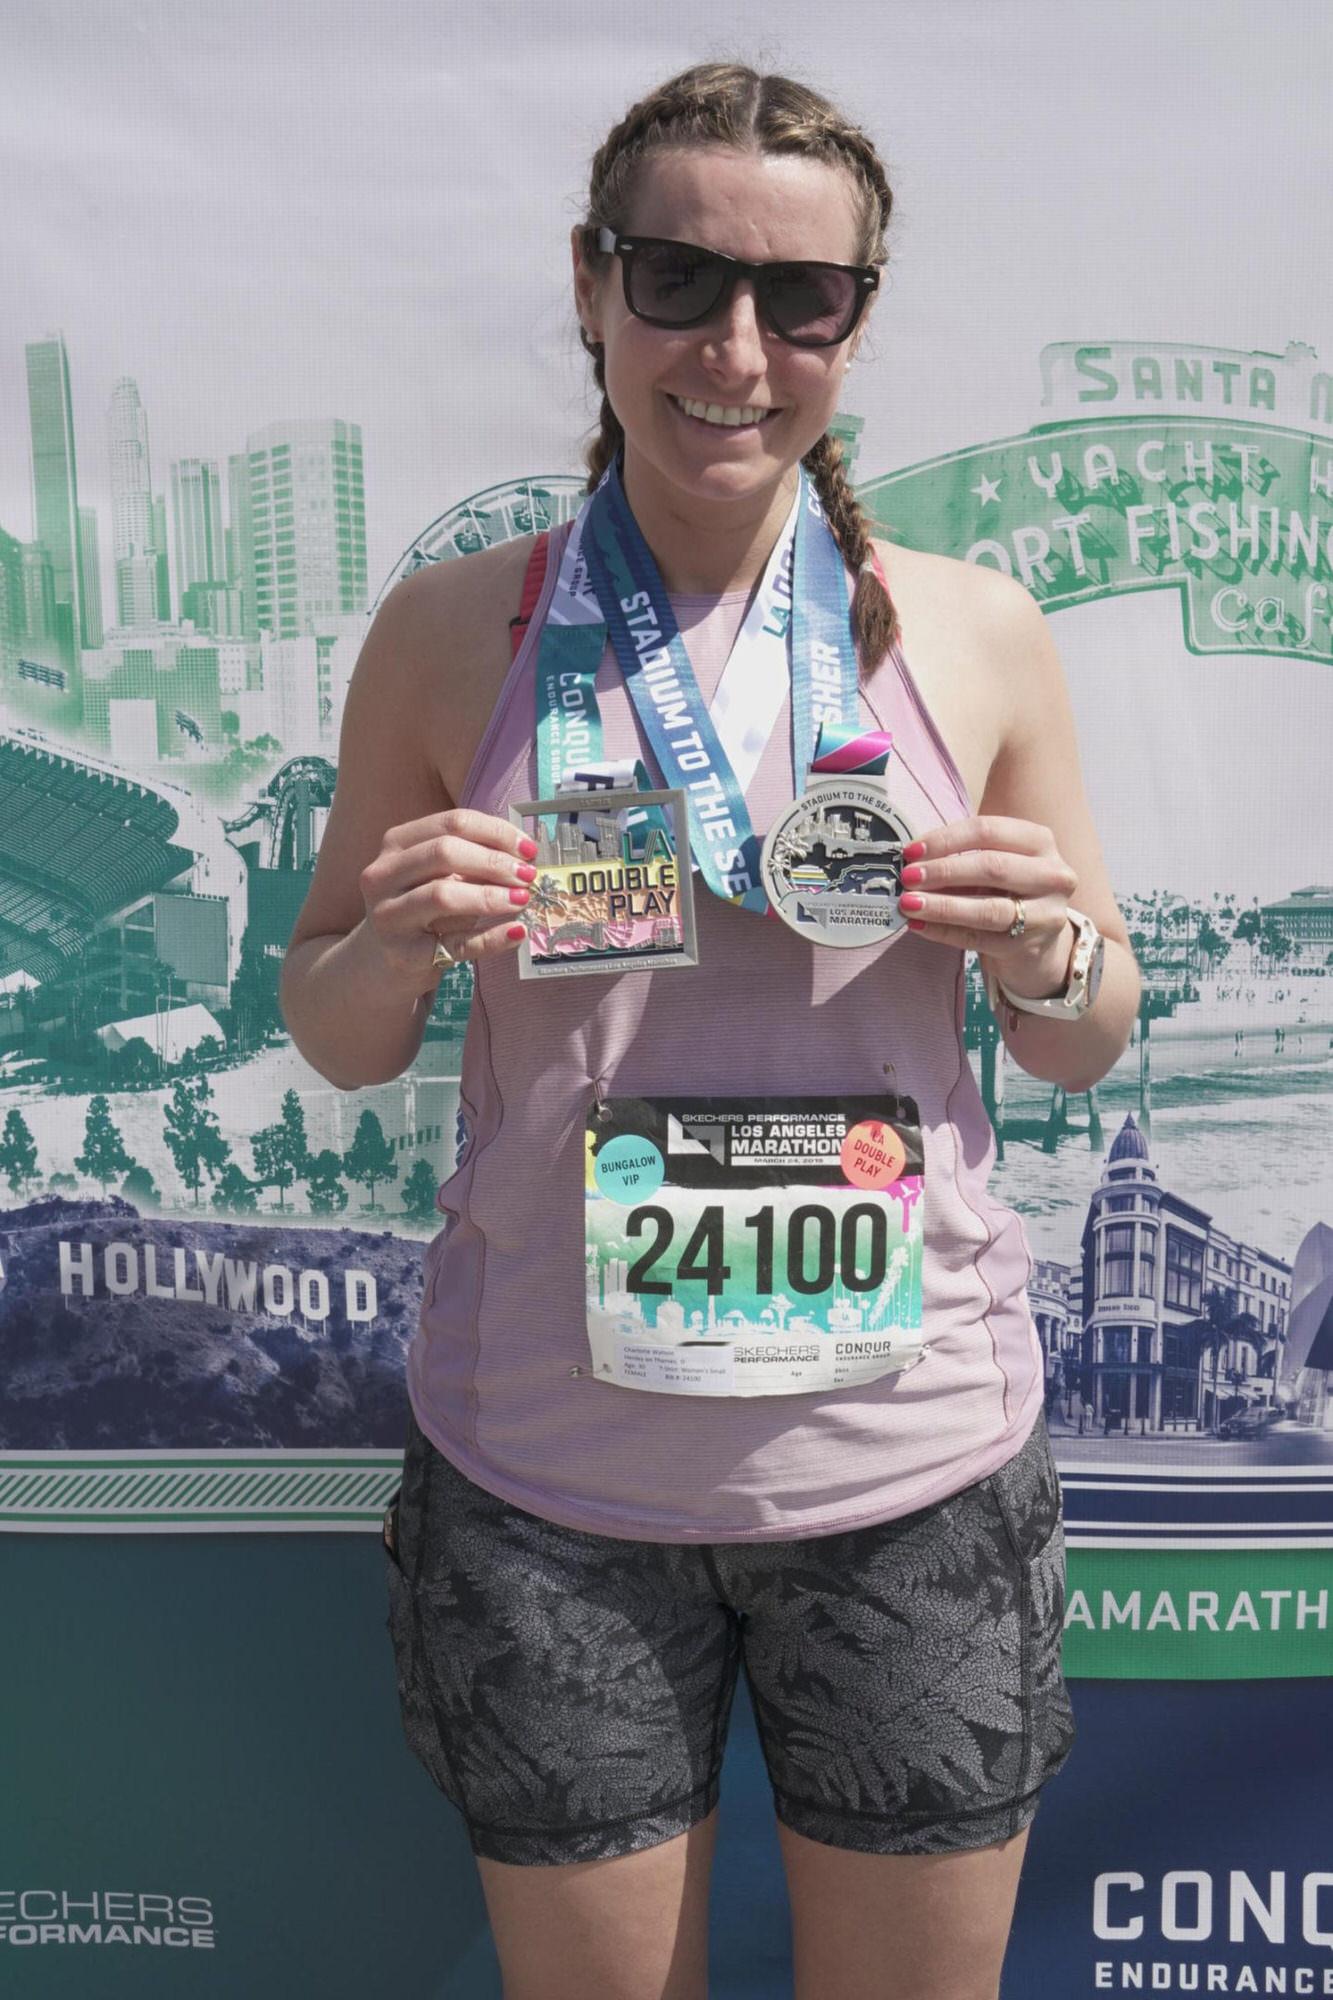 LA Marathon 2019 Race Recap